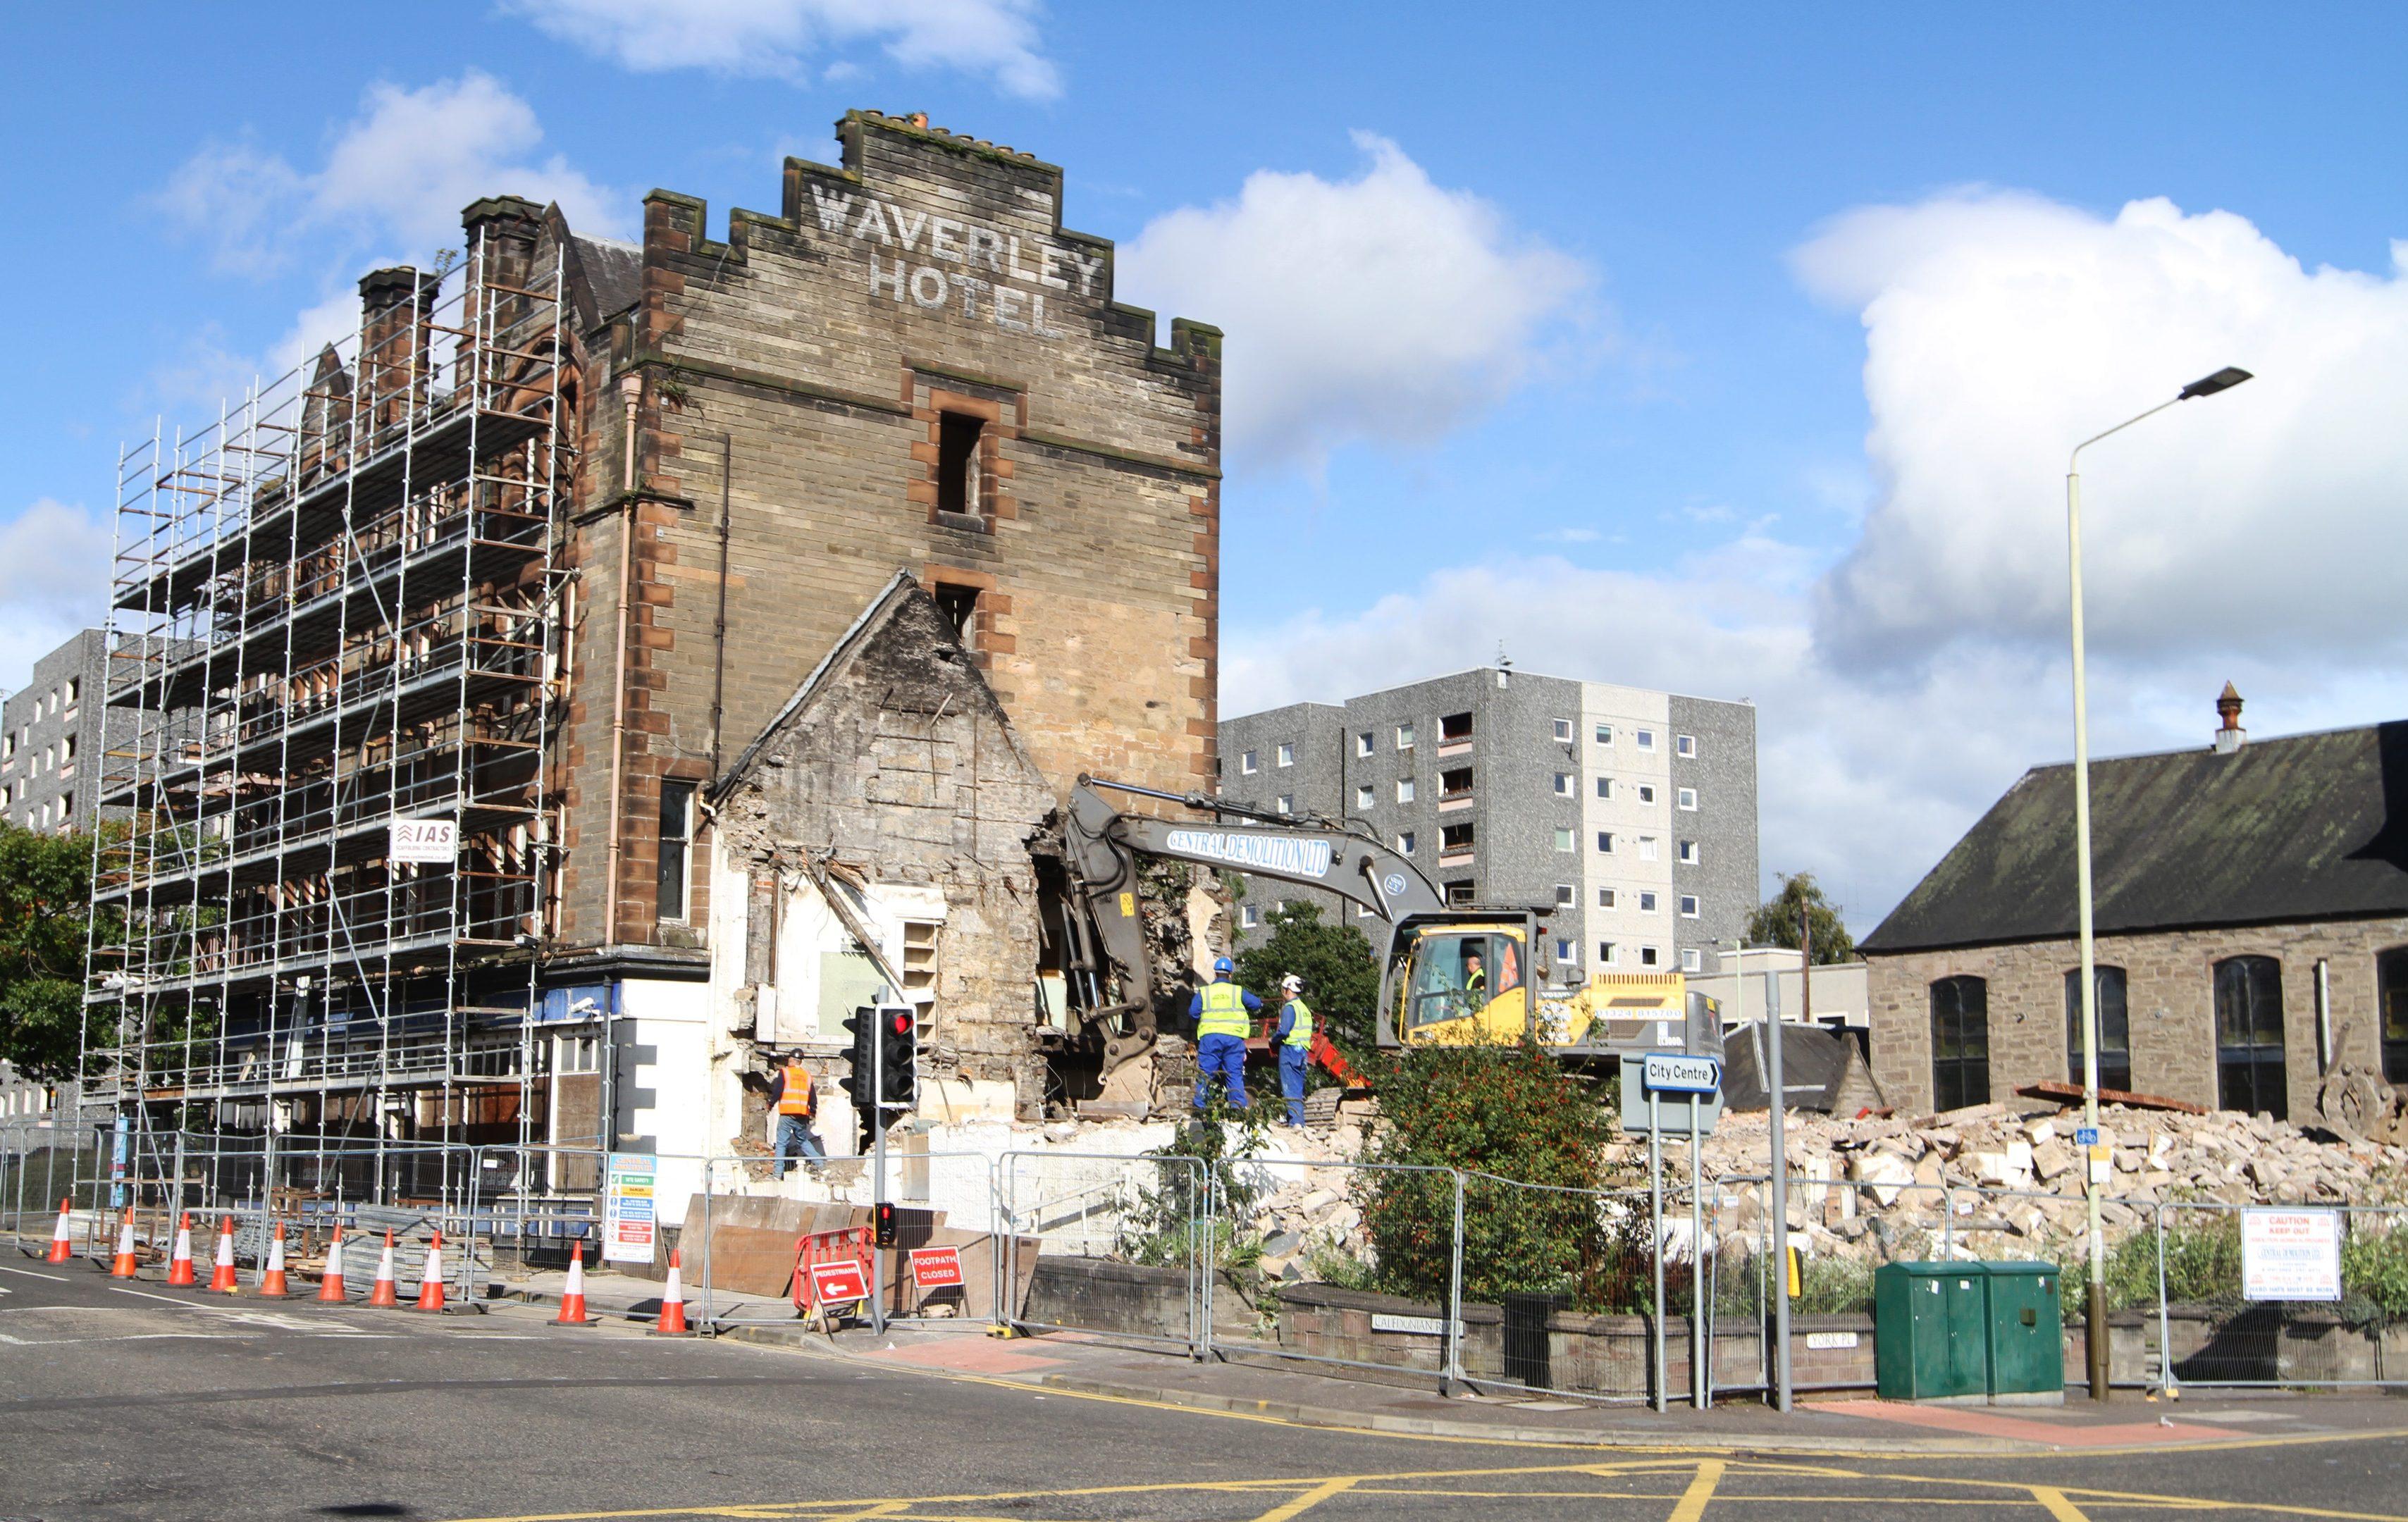 The Waverley Hotel during demolition.